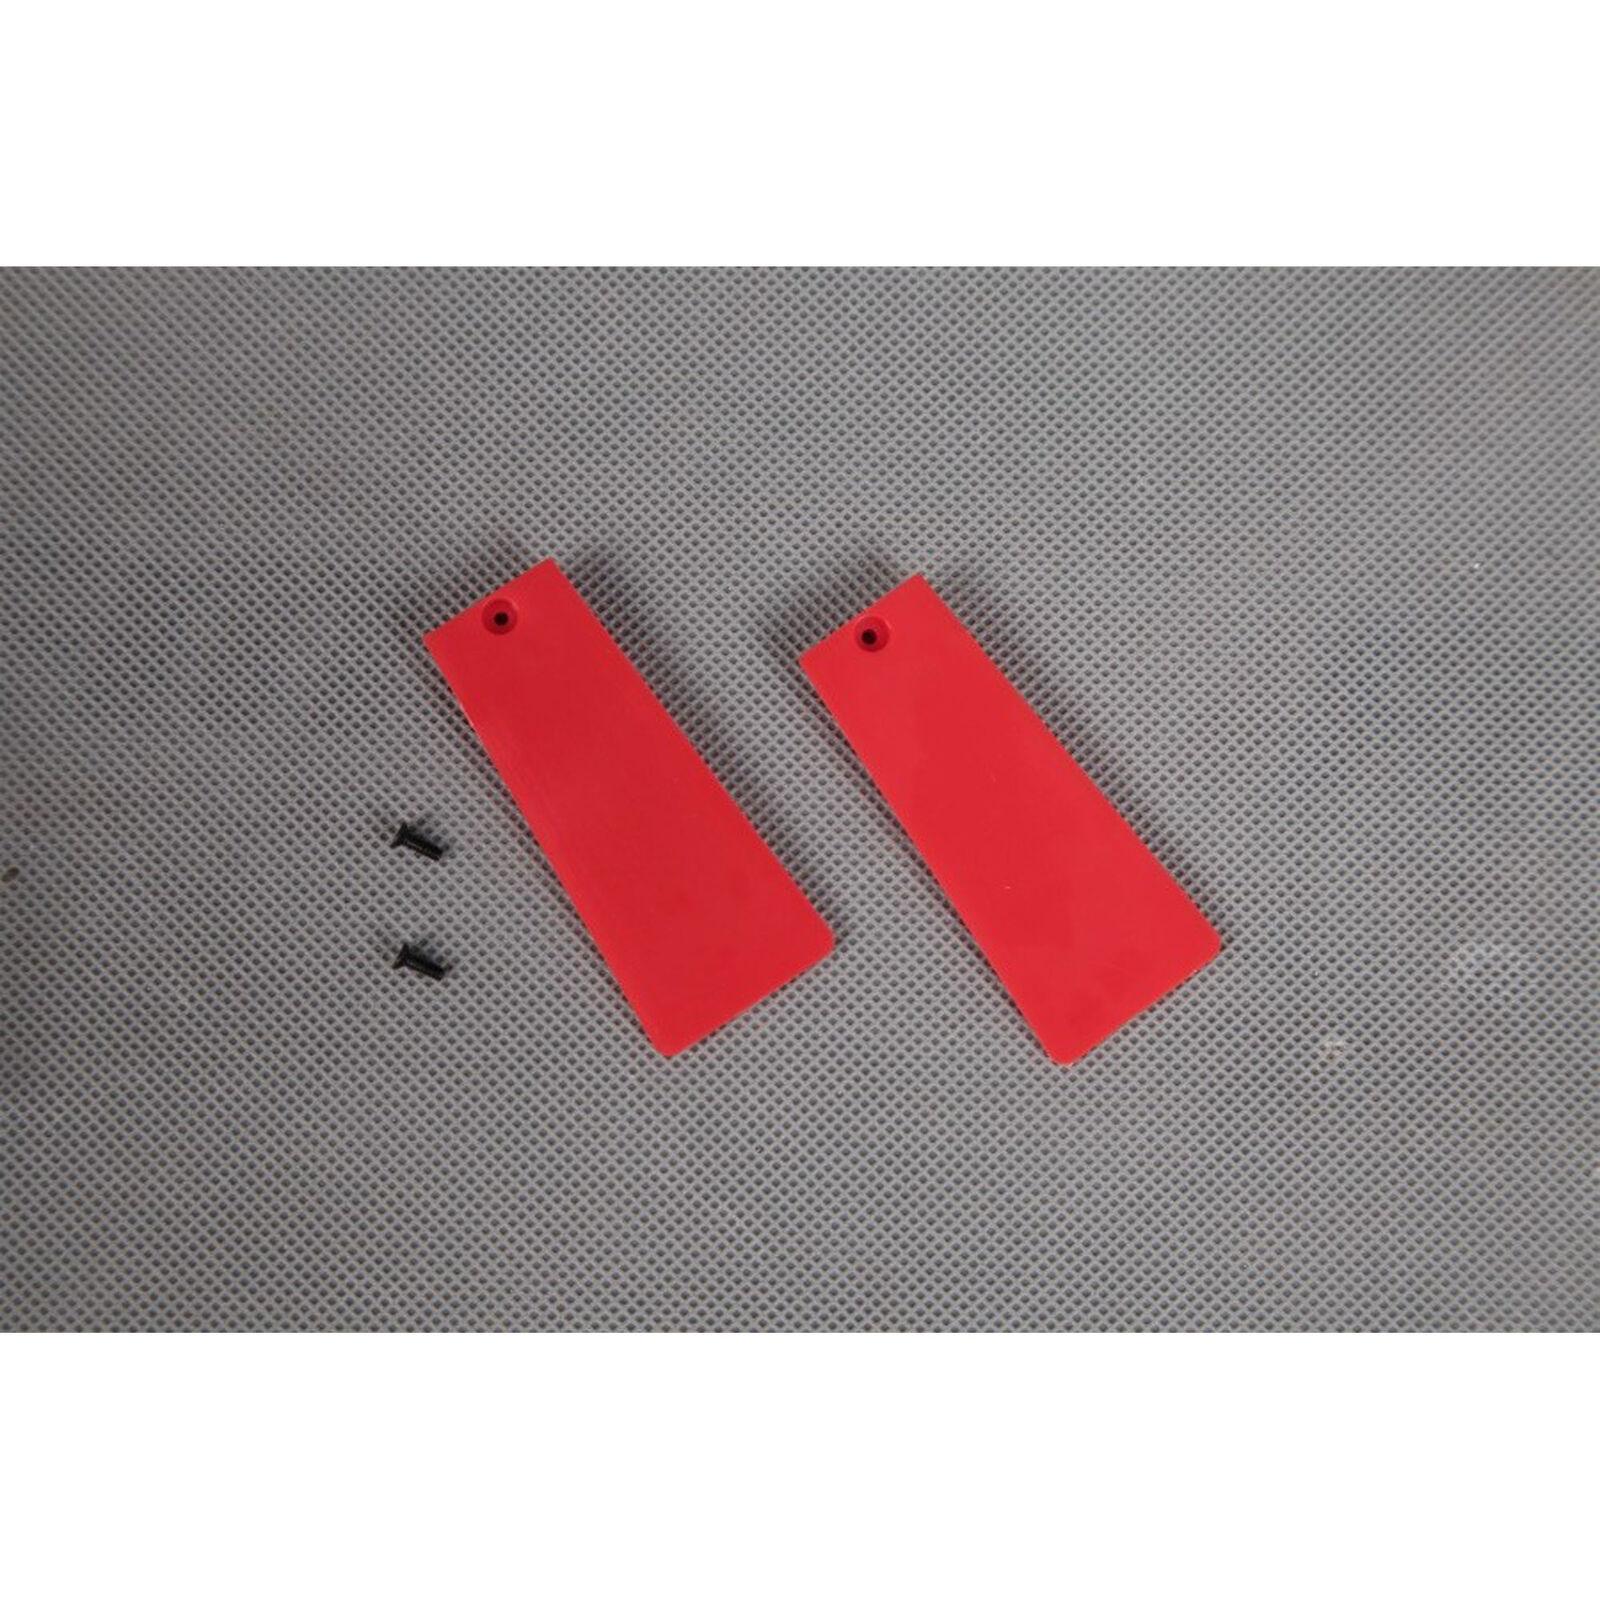 Main Landing Gear Door: Red Avanti